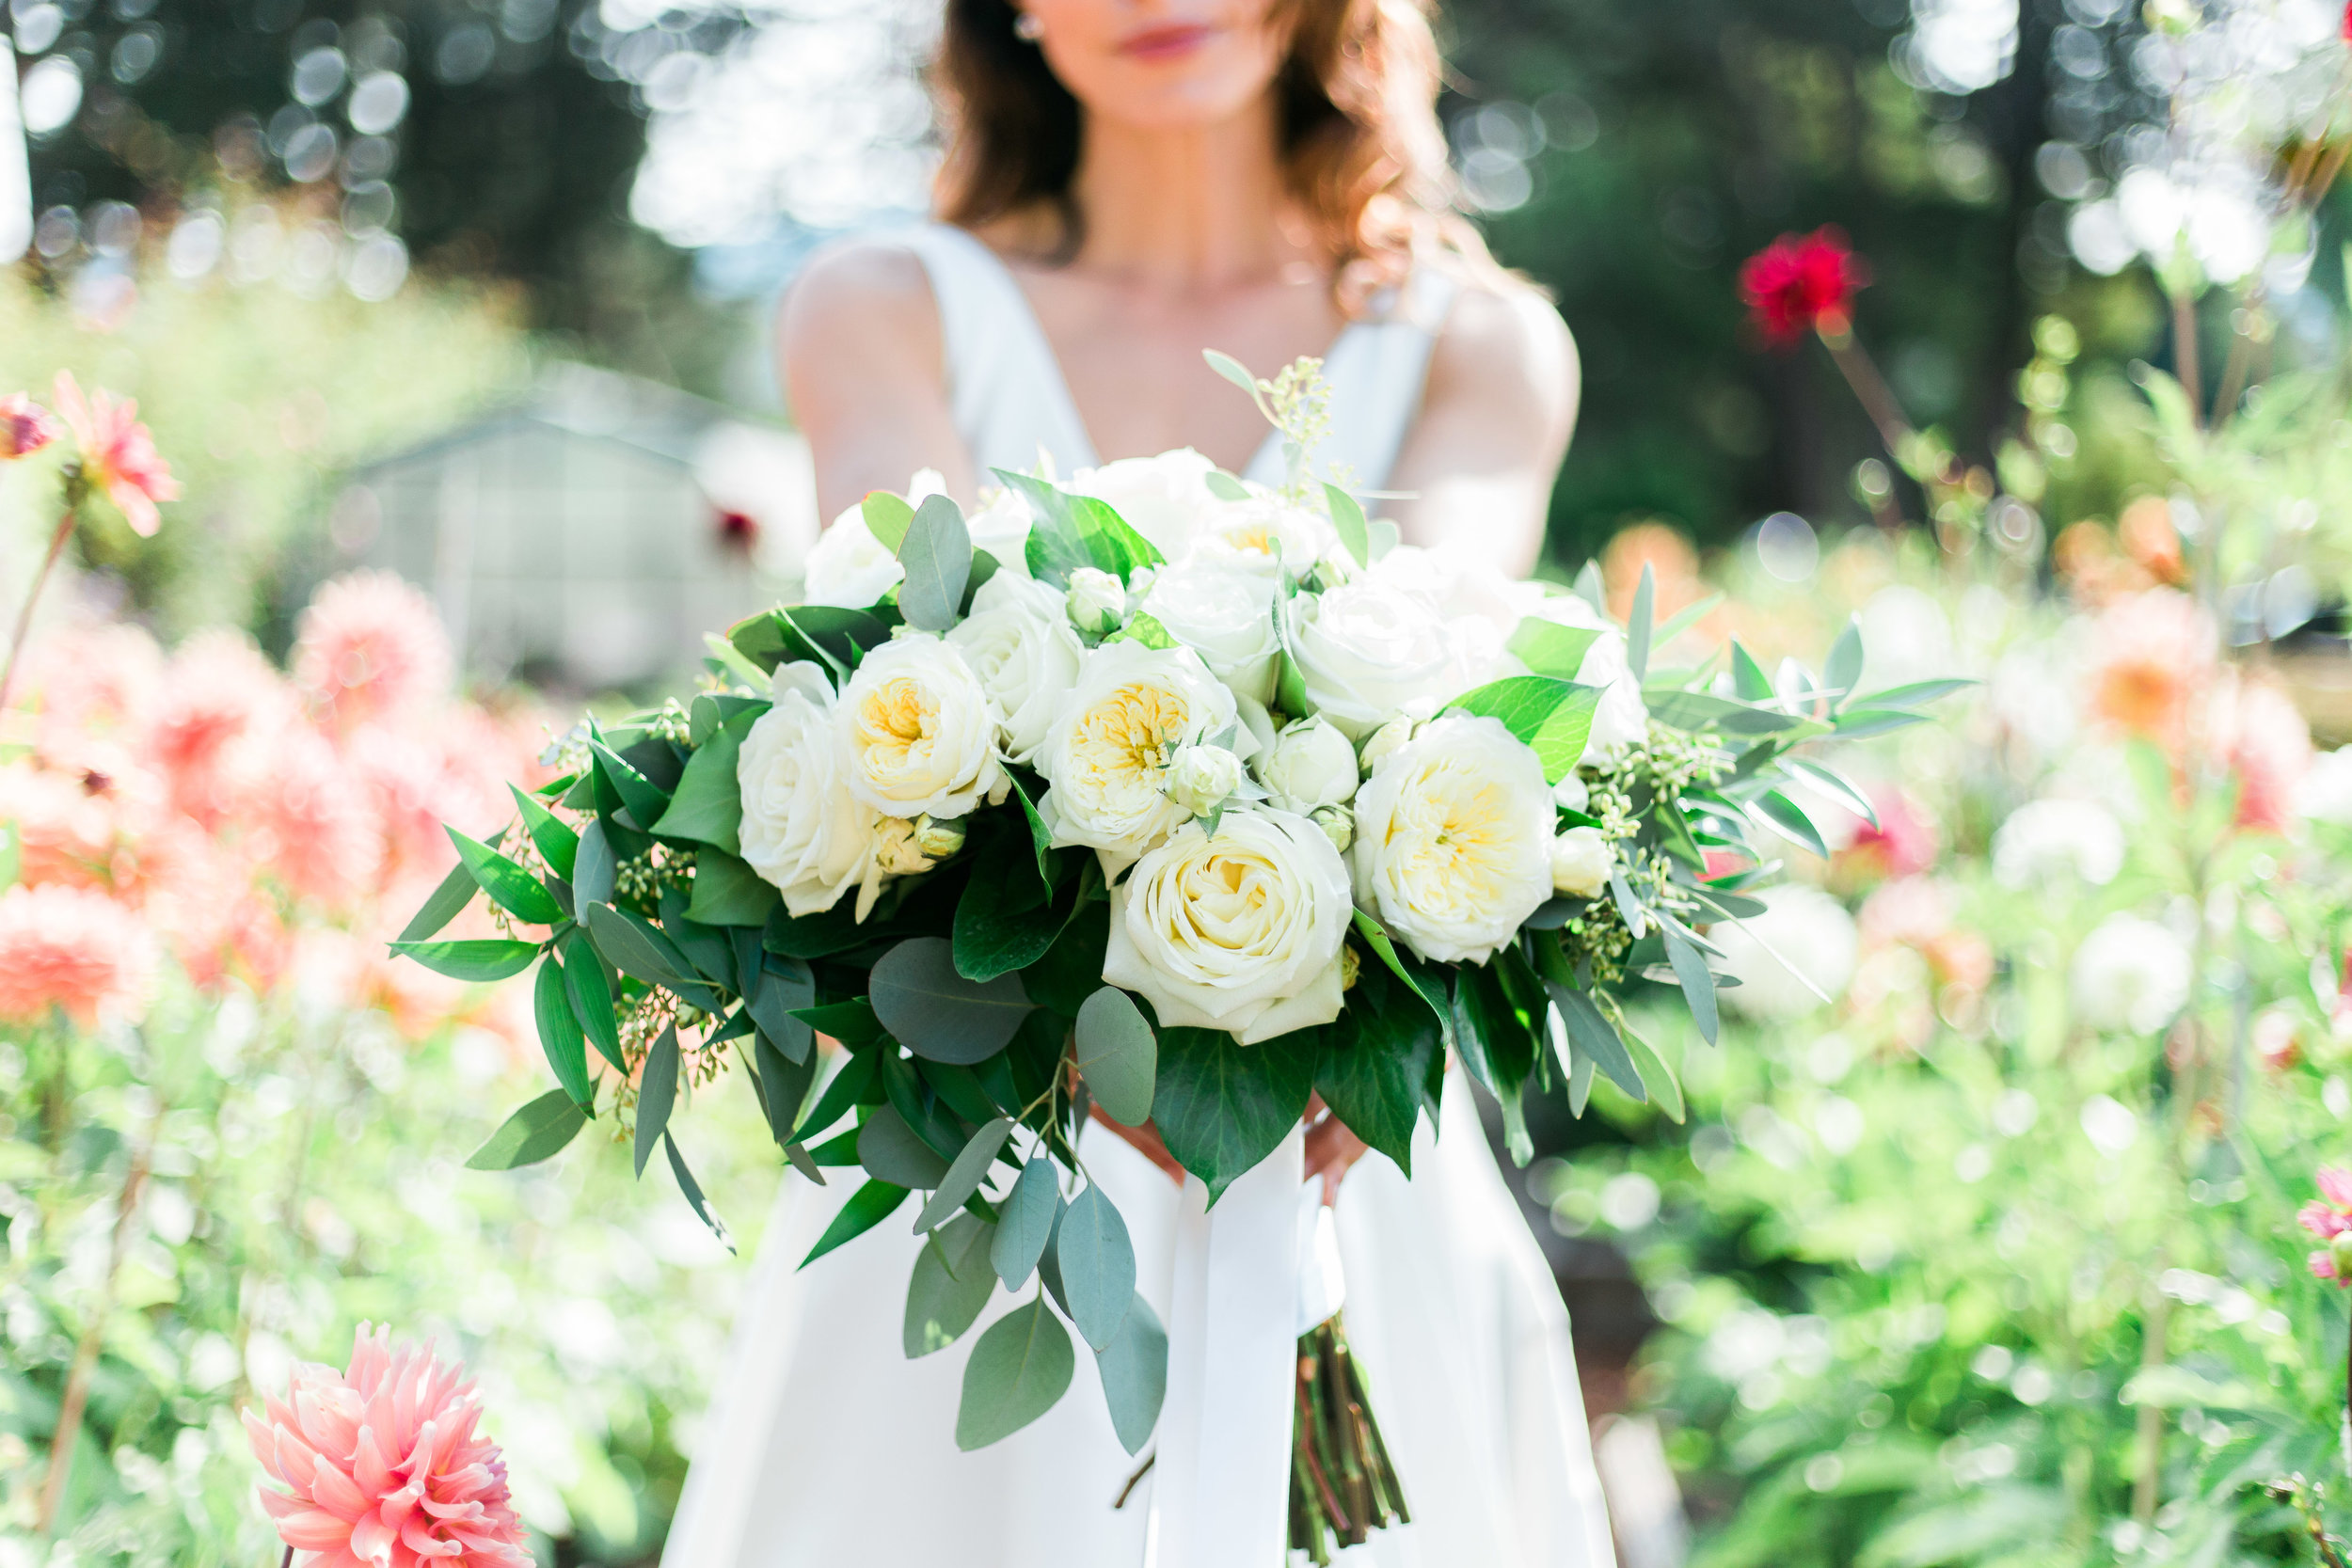 Holly-Nicholas-Wedding-by-JBJ-Pictures-224.jpg